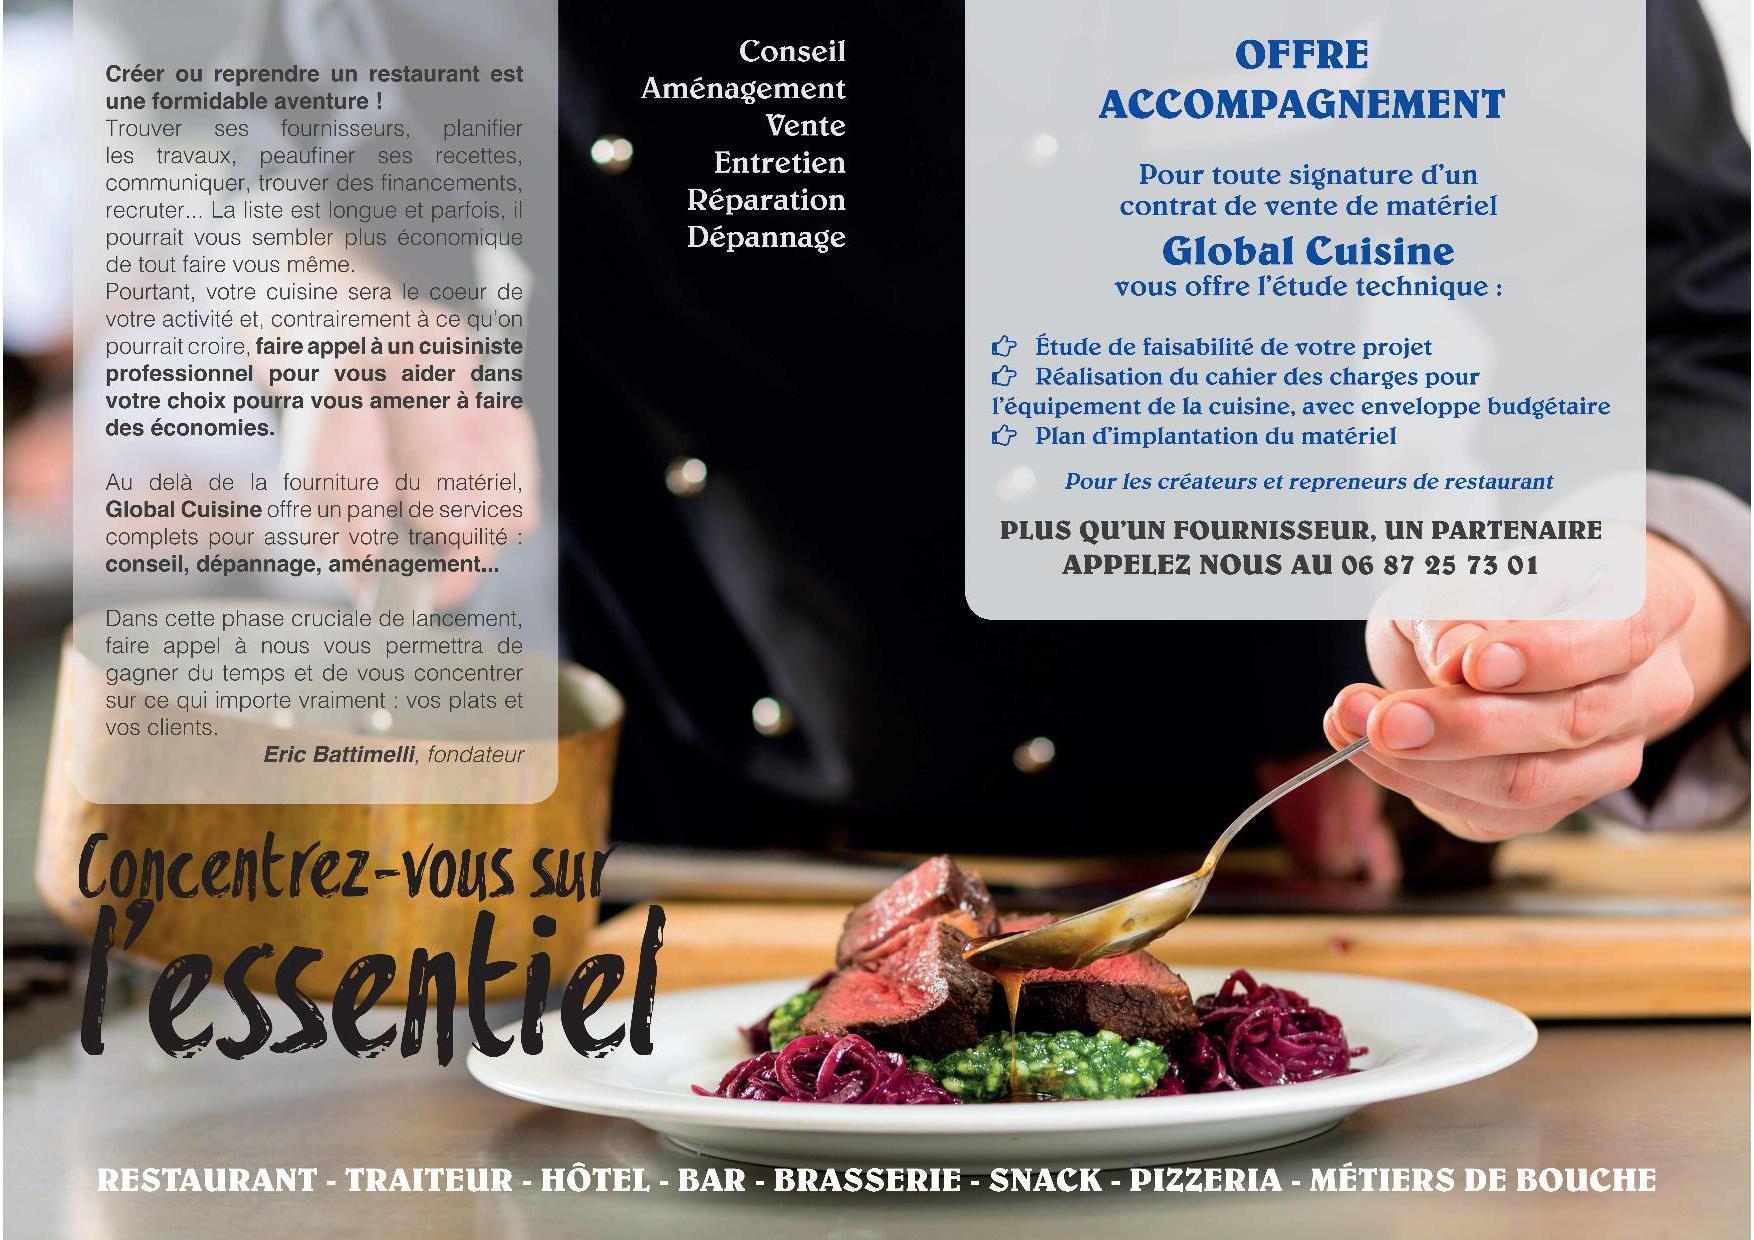 global cuisine - cuisine professionnelle - Renovation Cuisine Professionnelle